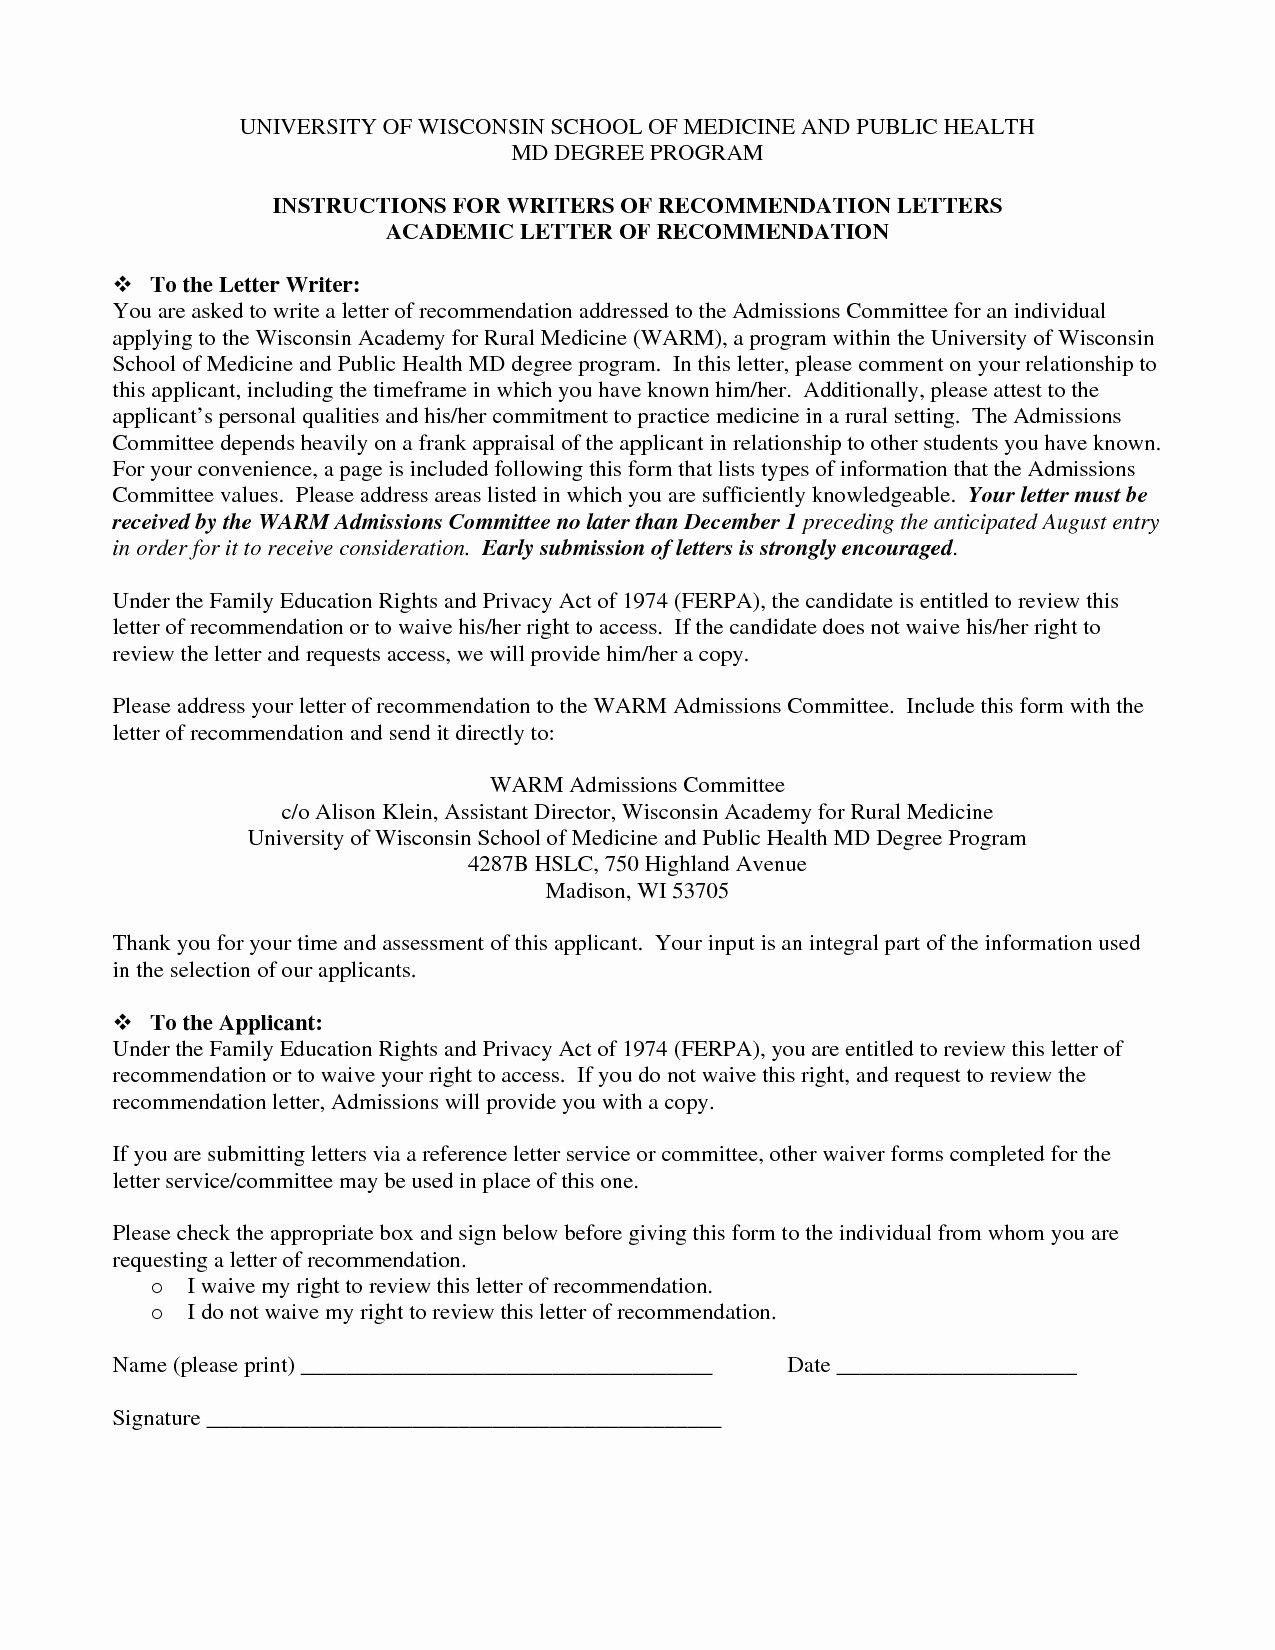 Med School Recommendation Letter Best Of Template for Letter Re Mendation for Medical School